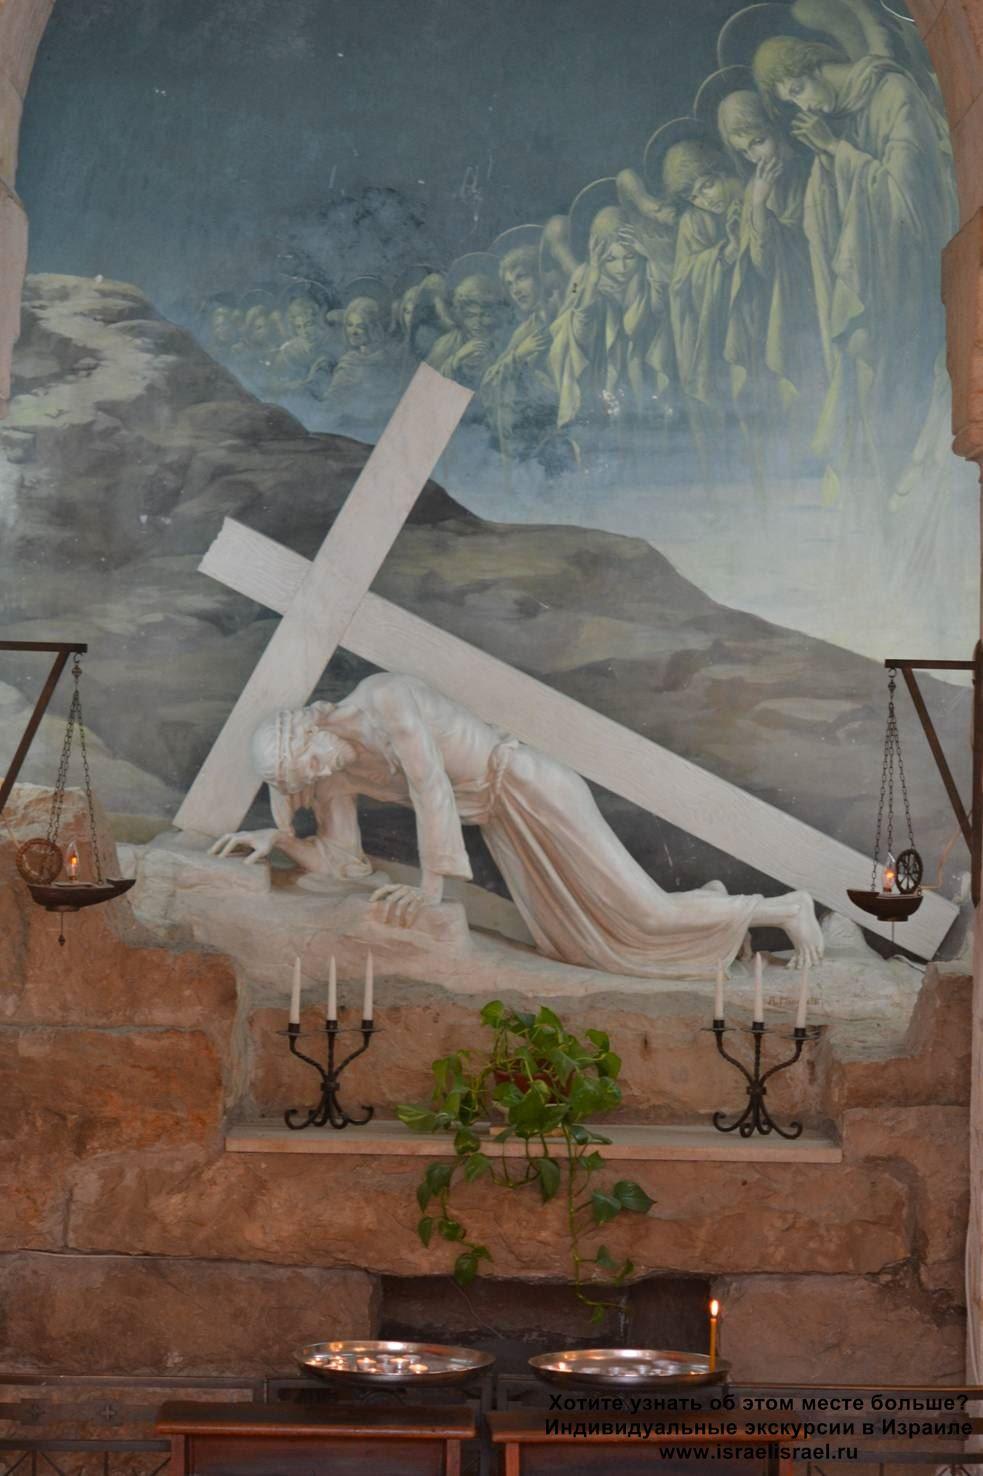 Церковь Виа долорса 3 остановка